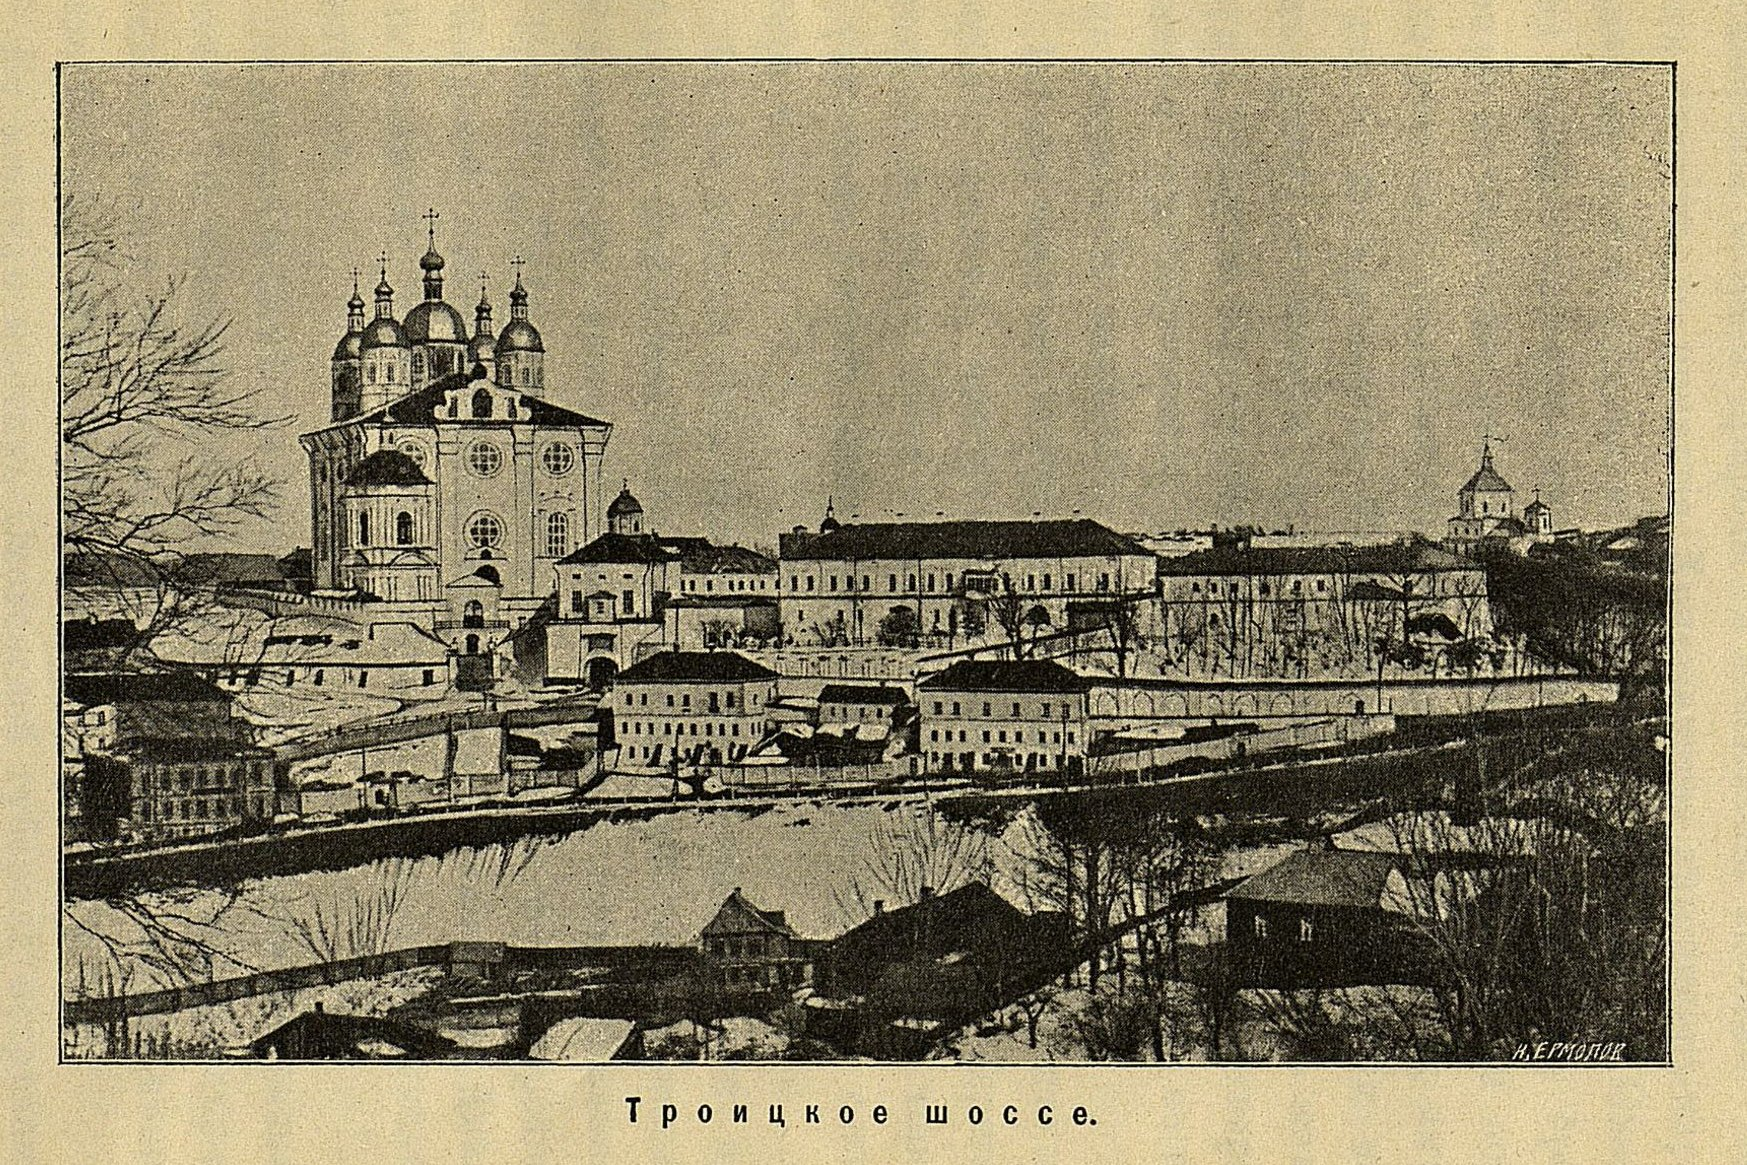 n-ermolov-troitskoe_guide-grachev-1908_gpib_p4-5